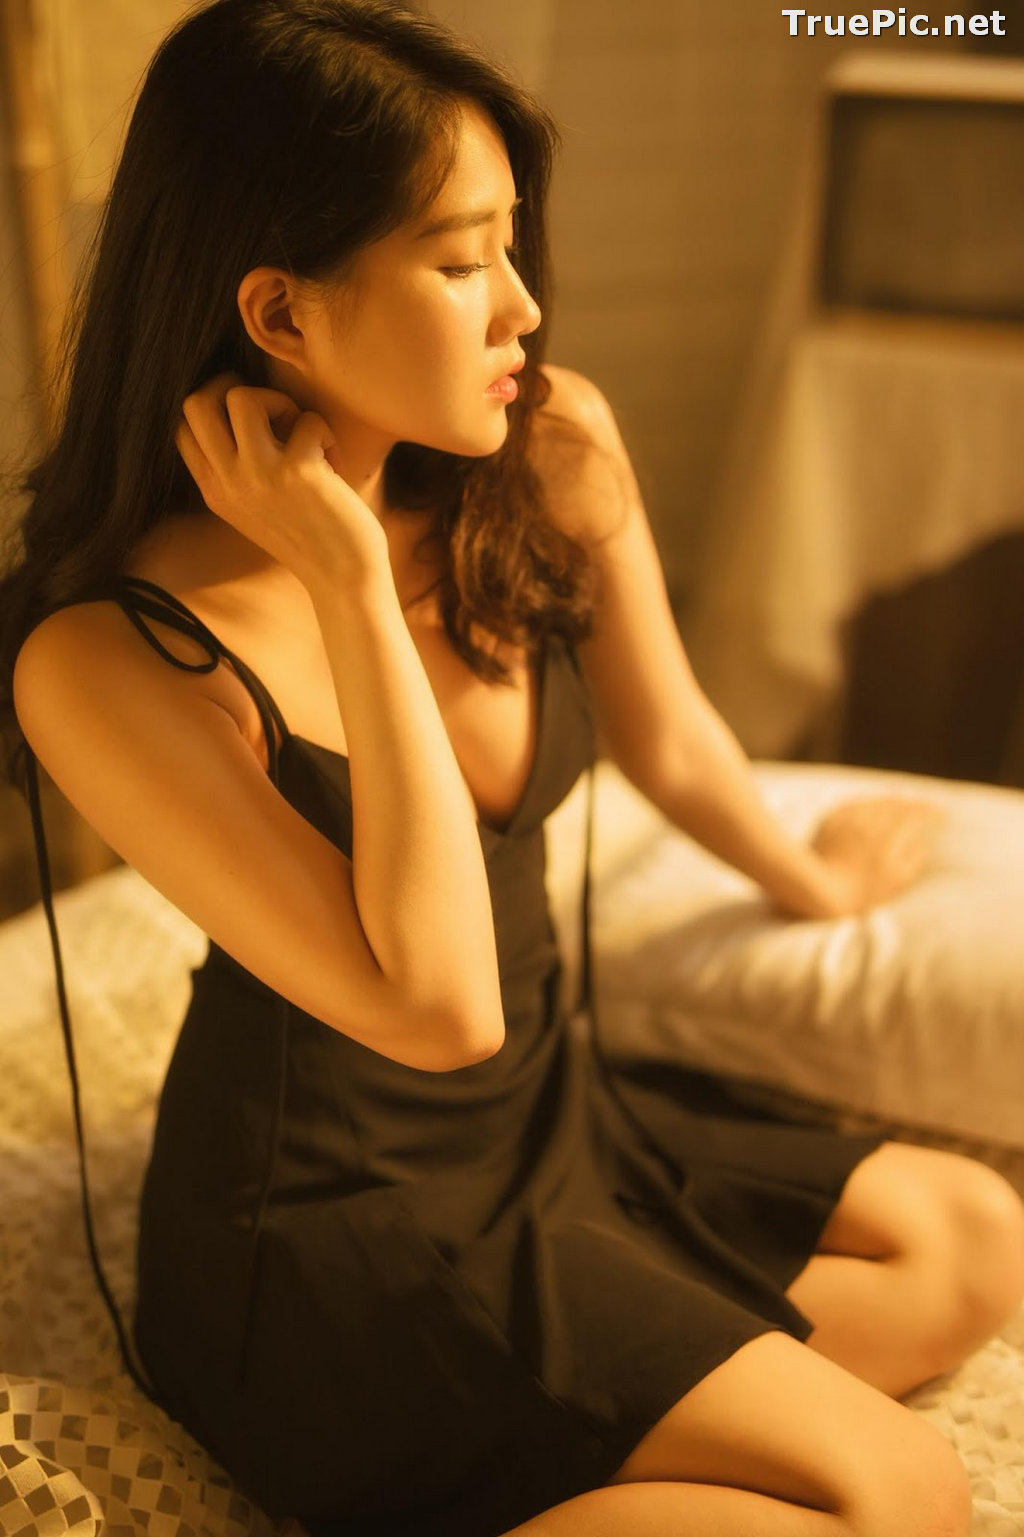 Image Vietnamese Hot Girl - Nguyen Hoang Kieu Trinh - My Black Angel - TruePic.net - Picture-17